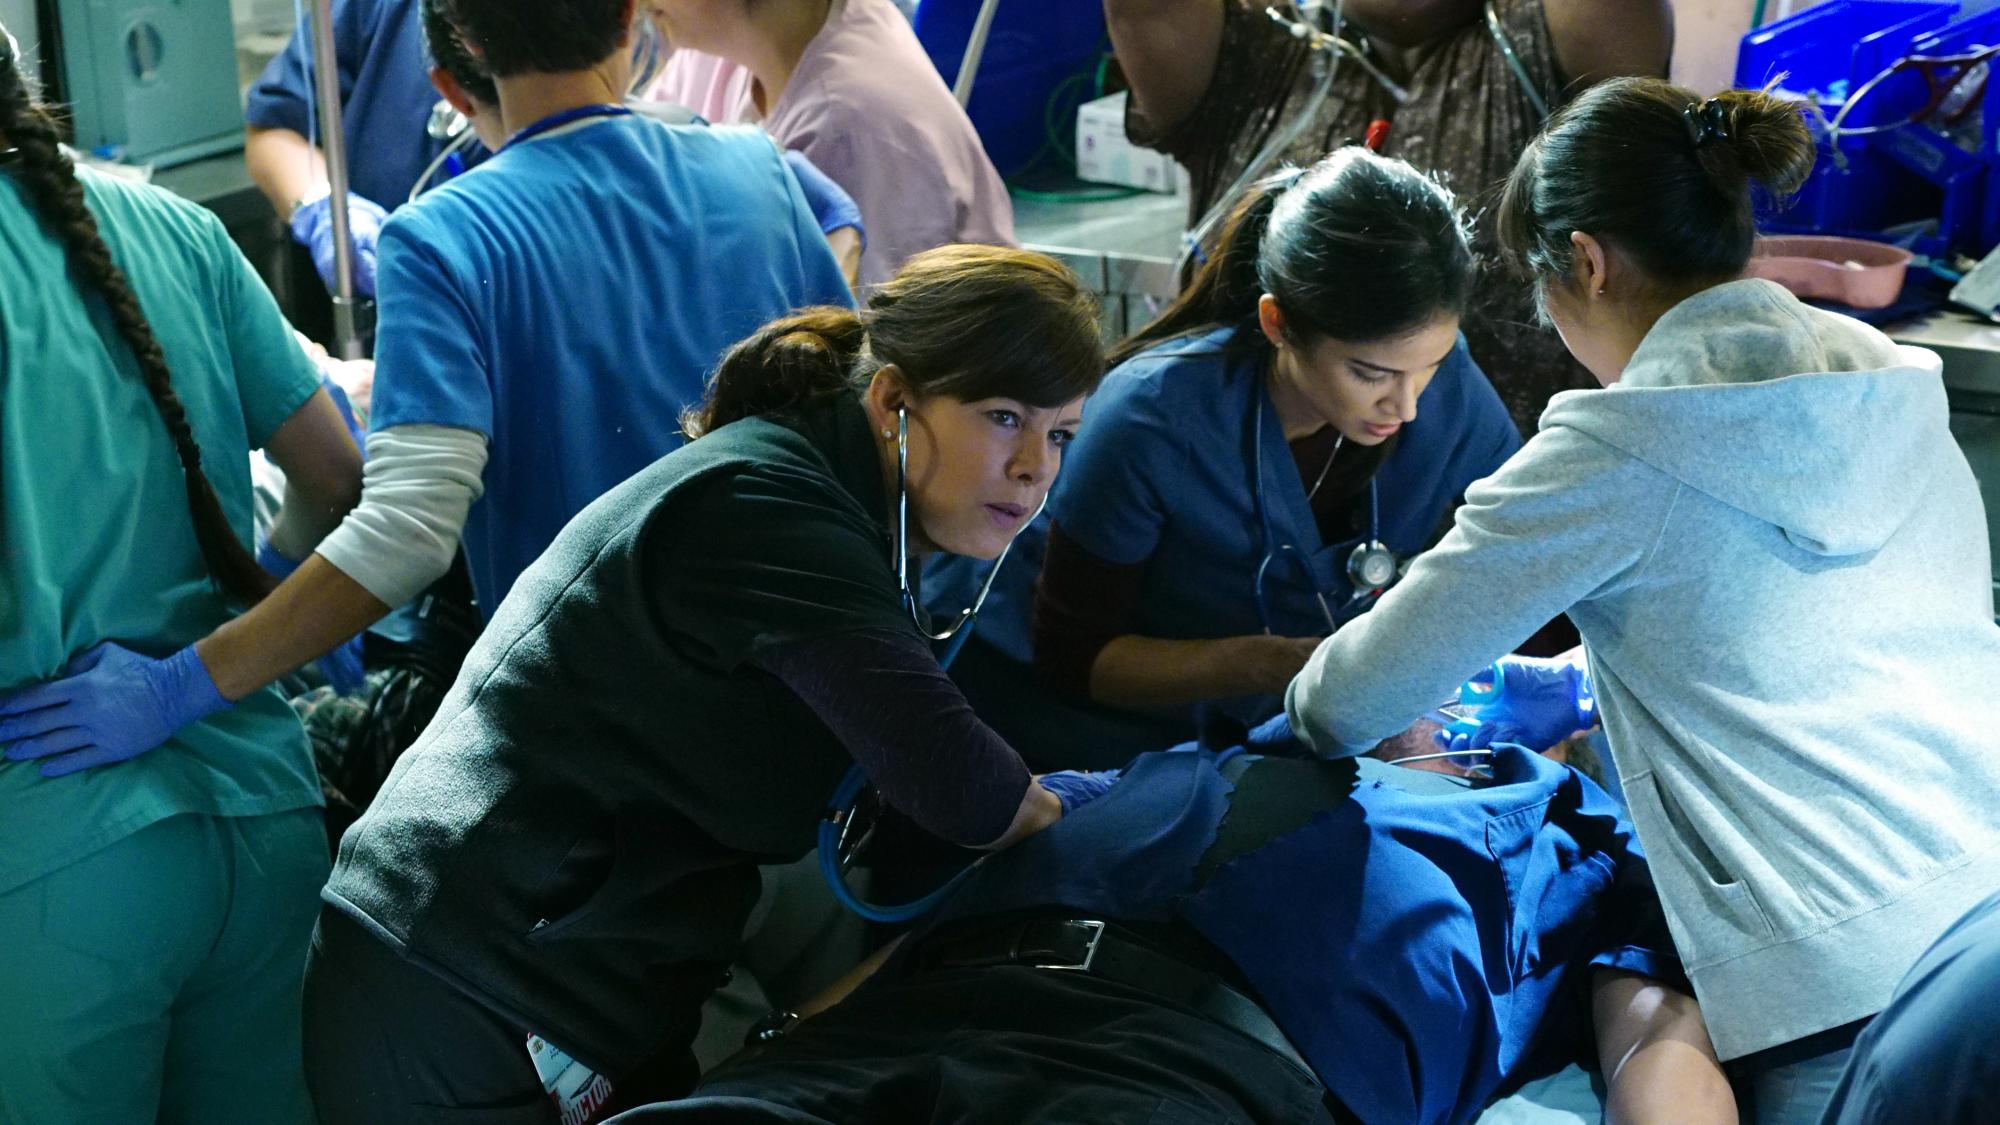 Marcia Gay Harden as Dr. Leanne Rorish and Melanie Chandra as Dr. Malaya Pineda